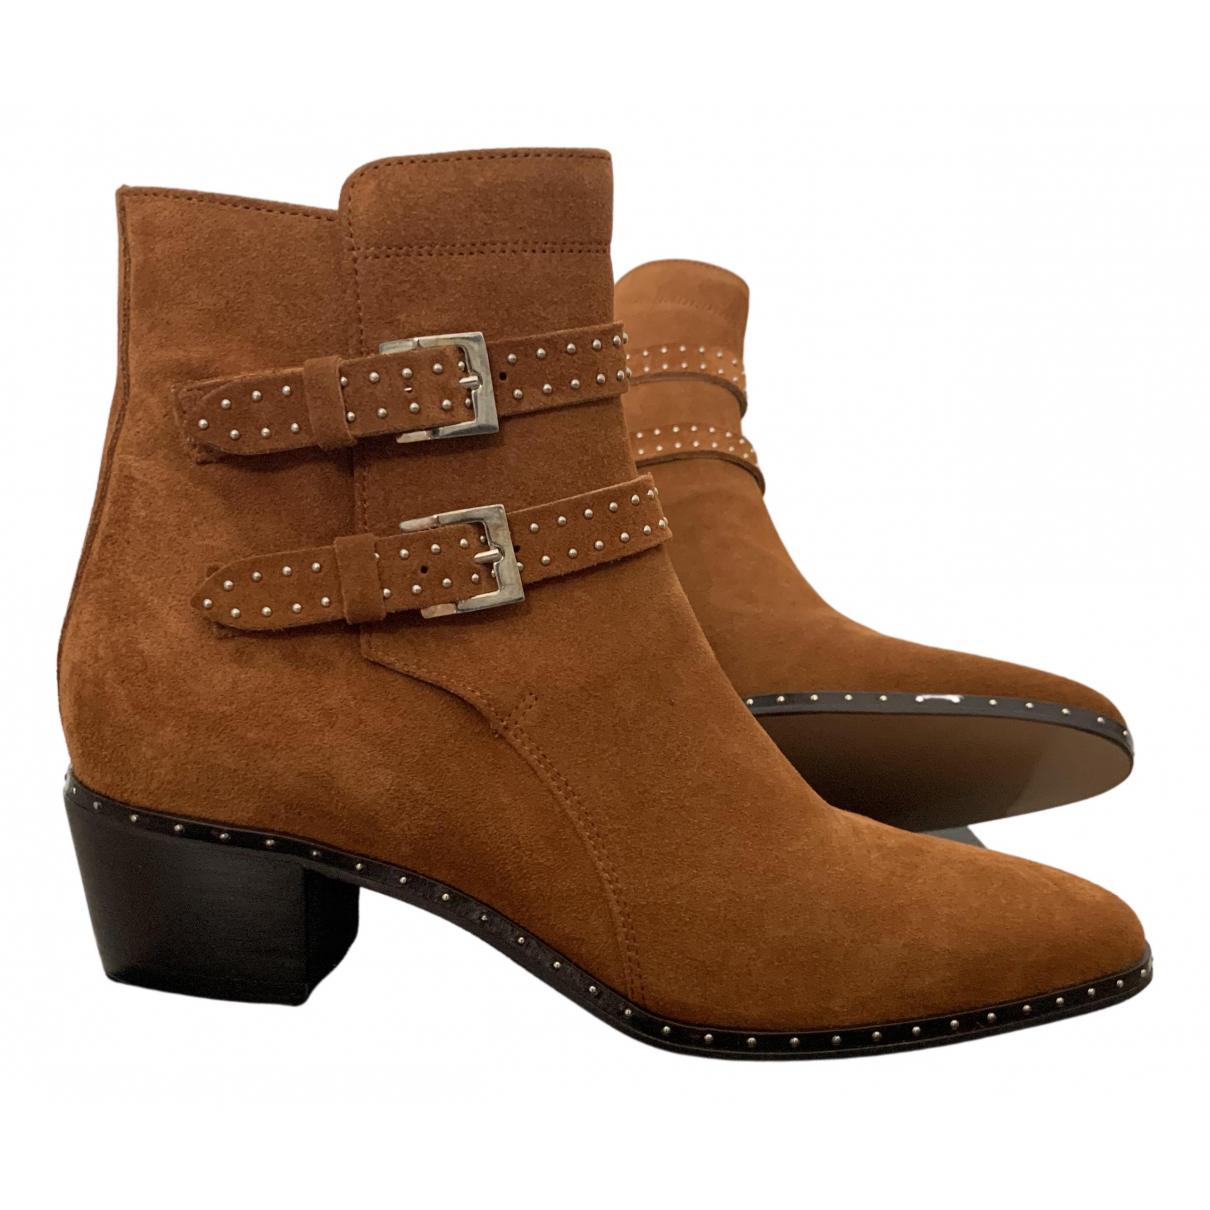 The Kooples - Boots Fall Winter 2019 pour femme en suede - camel